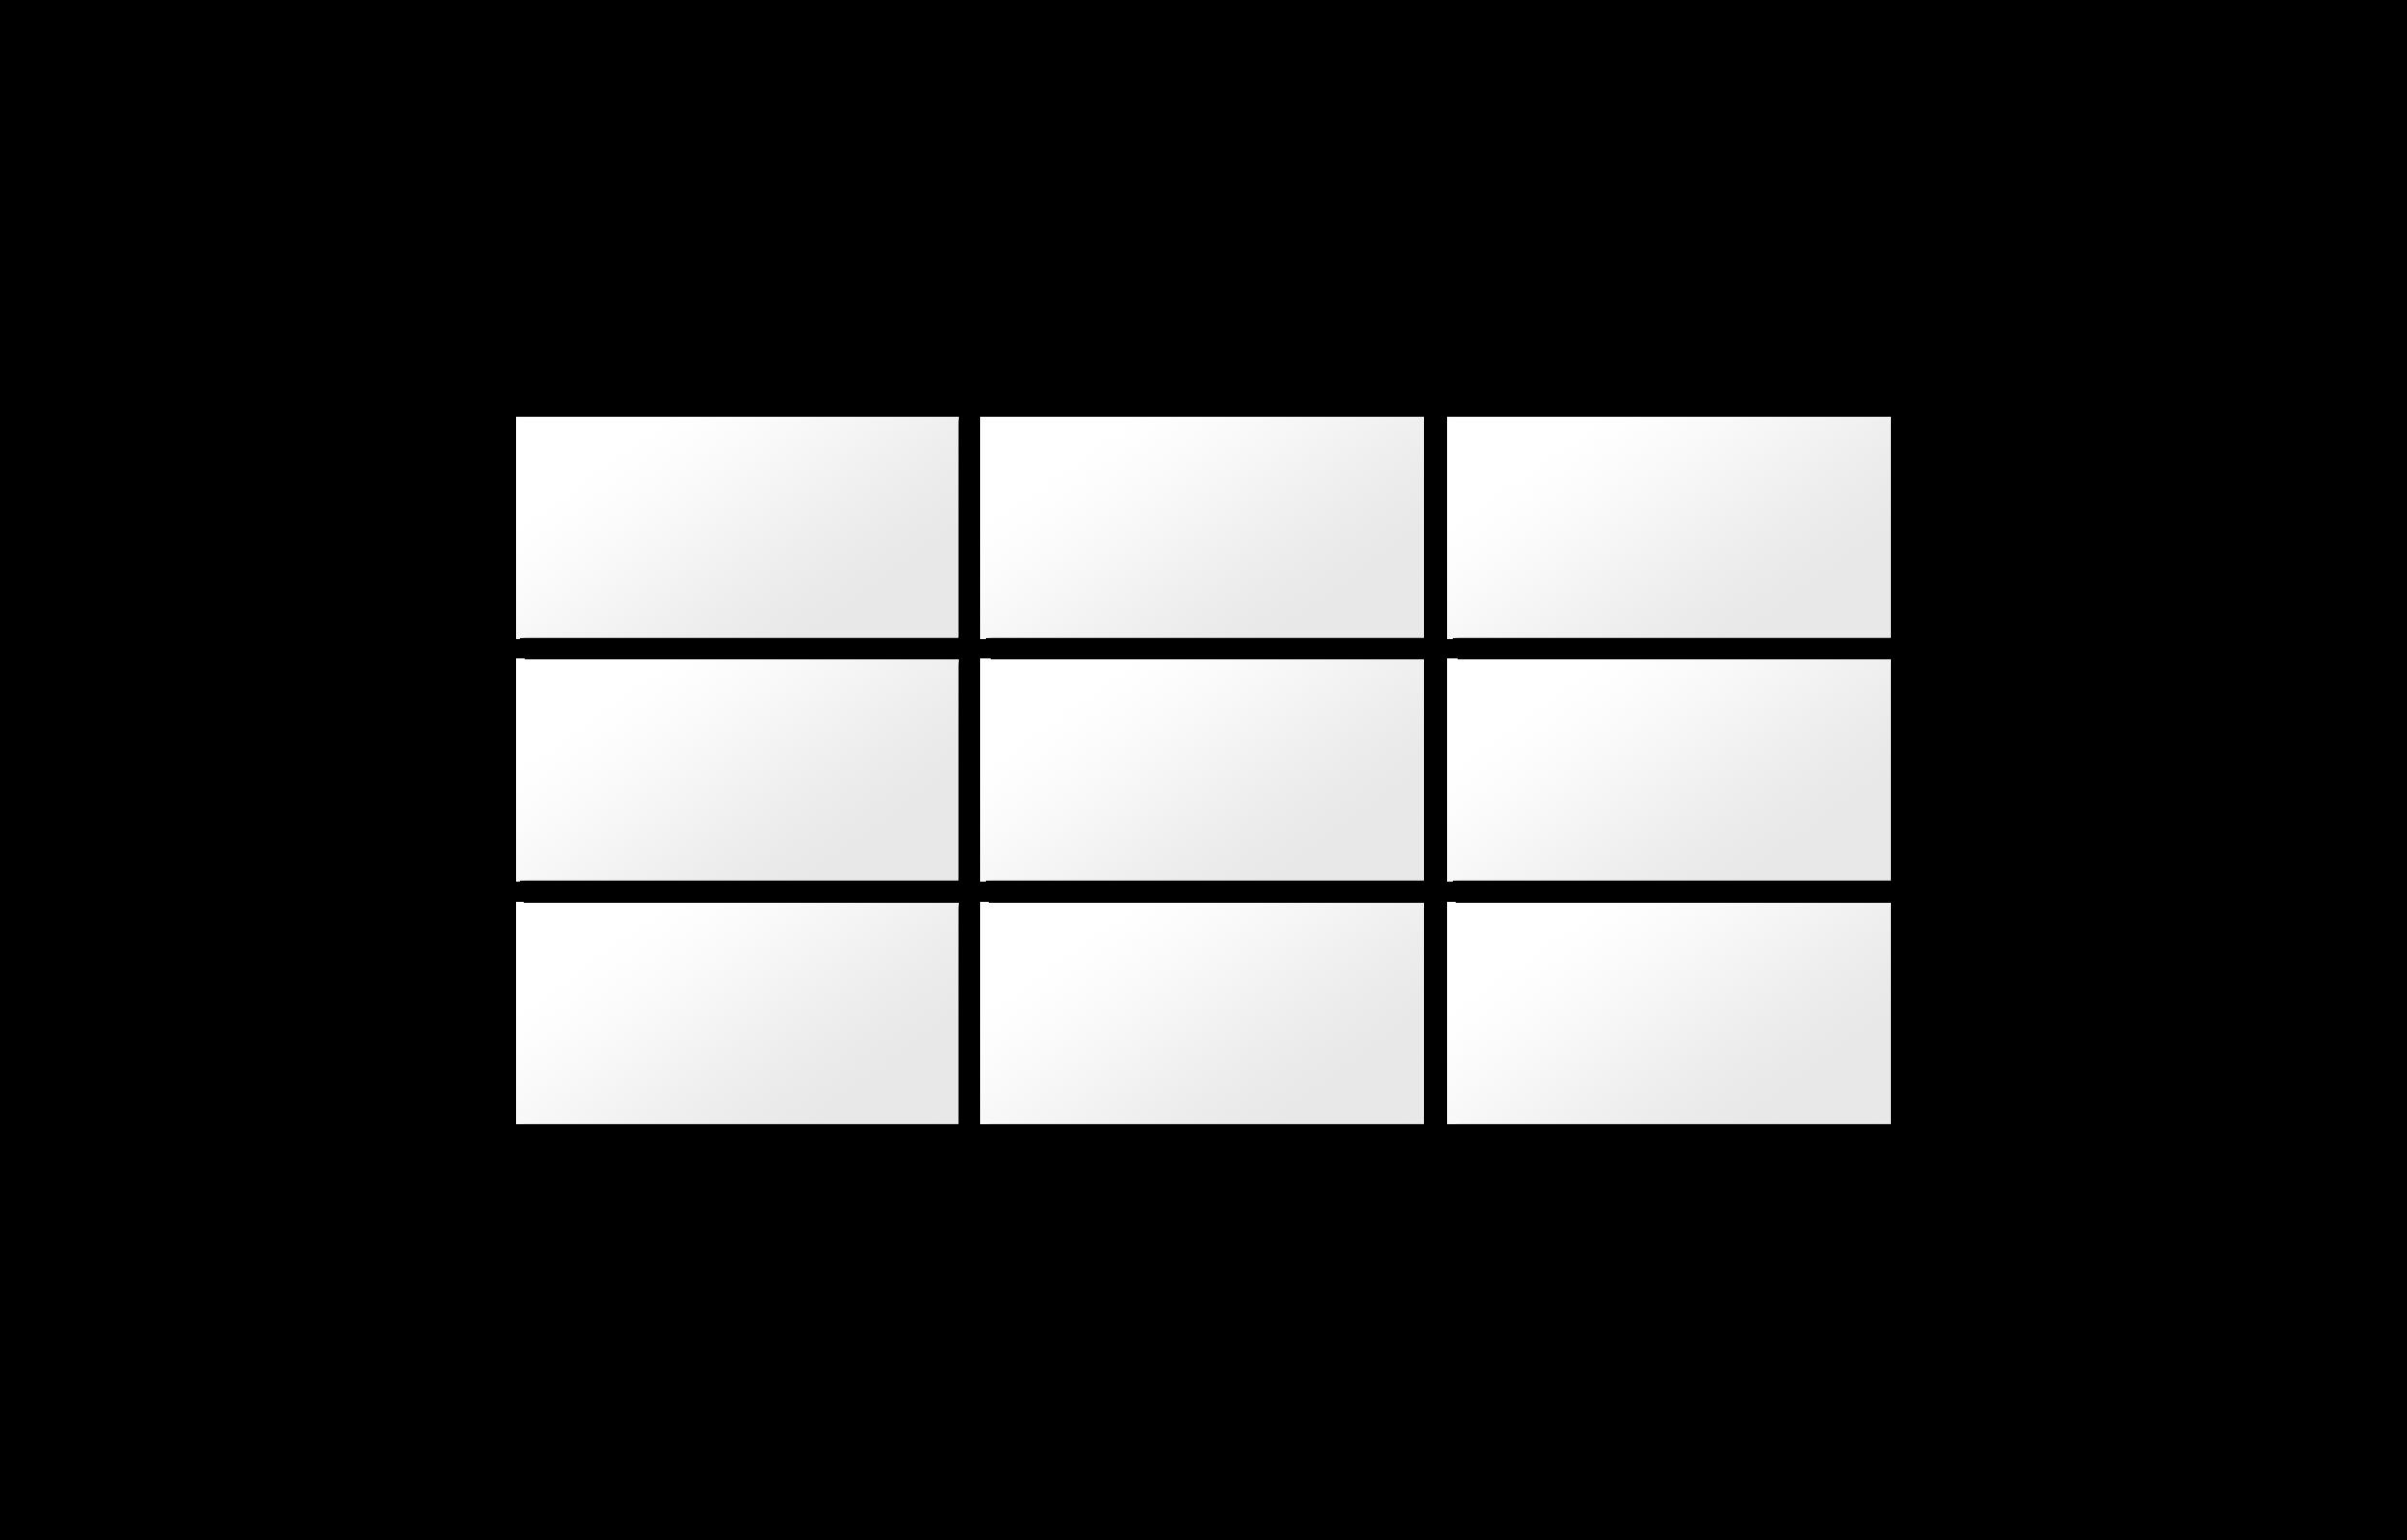 9-part tiled